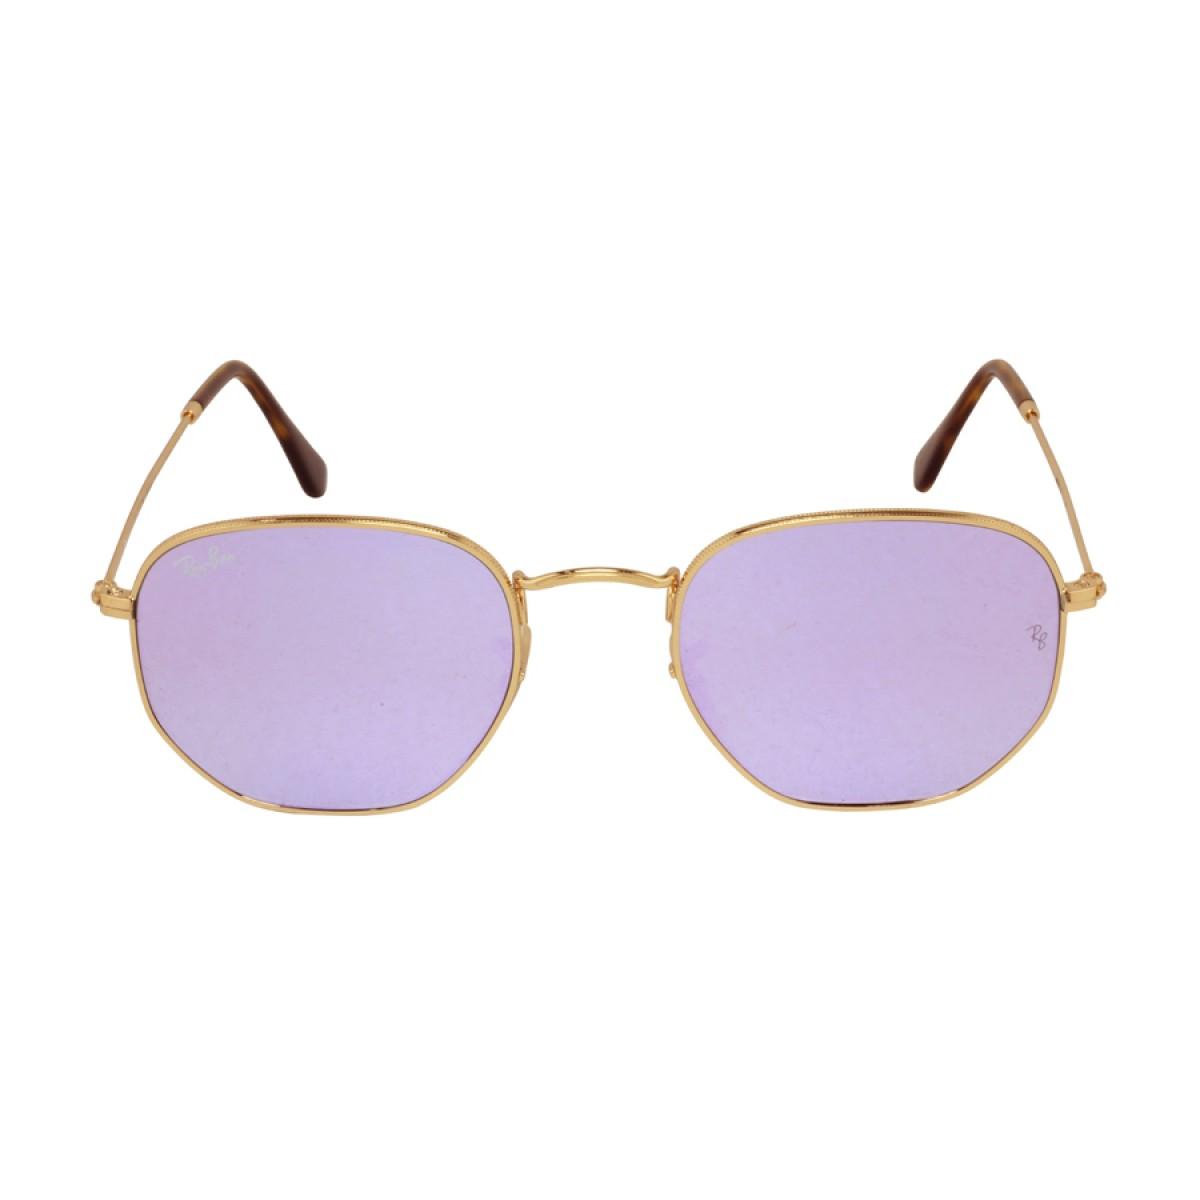 ece04d7e8cc Ray Ban Hexagonal Flat Lens Lilac Mirror Unisex Sunglasses RB3548N-001 8O -  Sunglasses - Fashion World